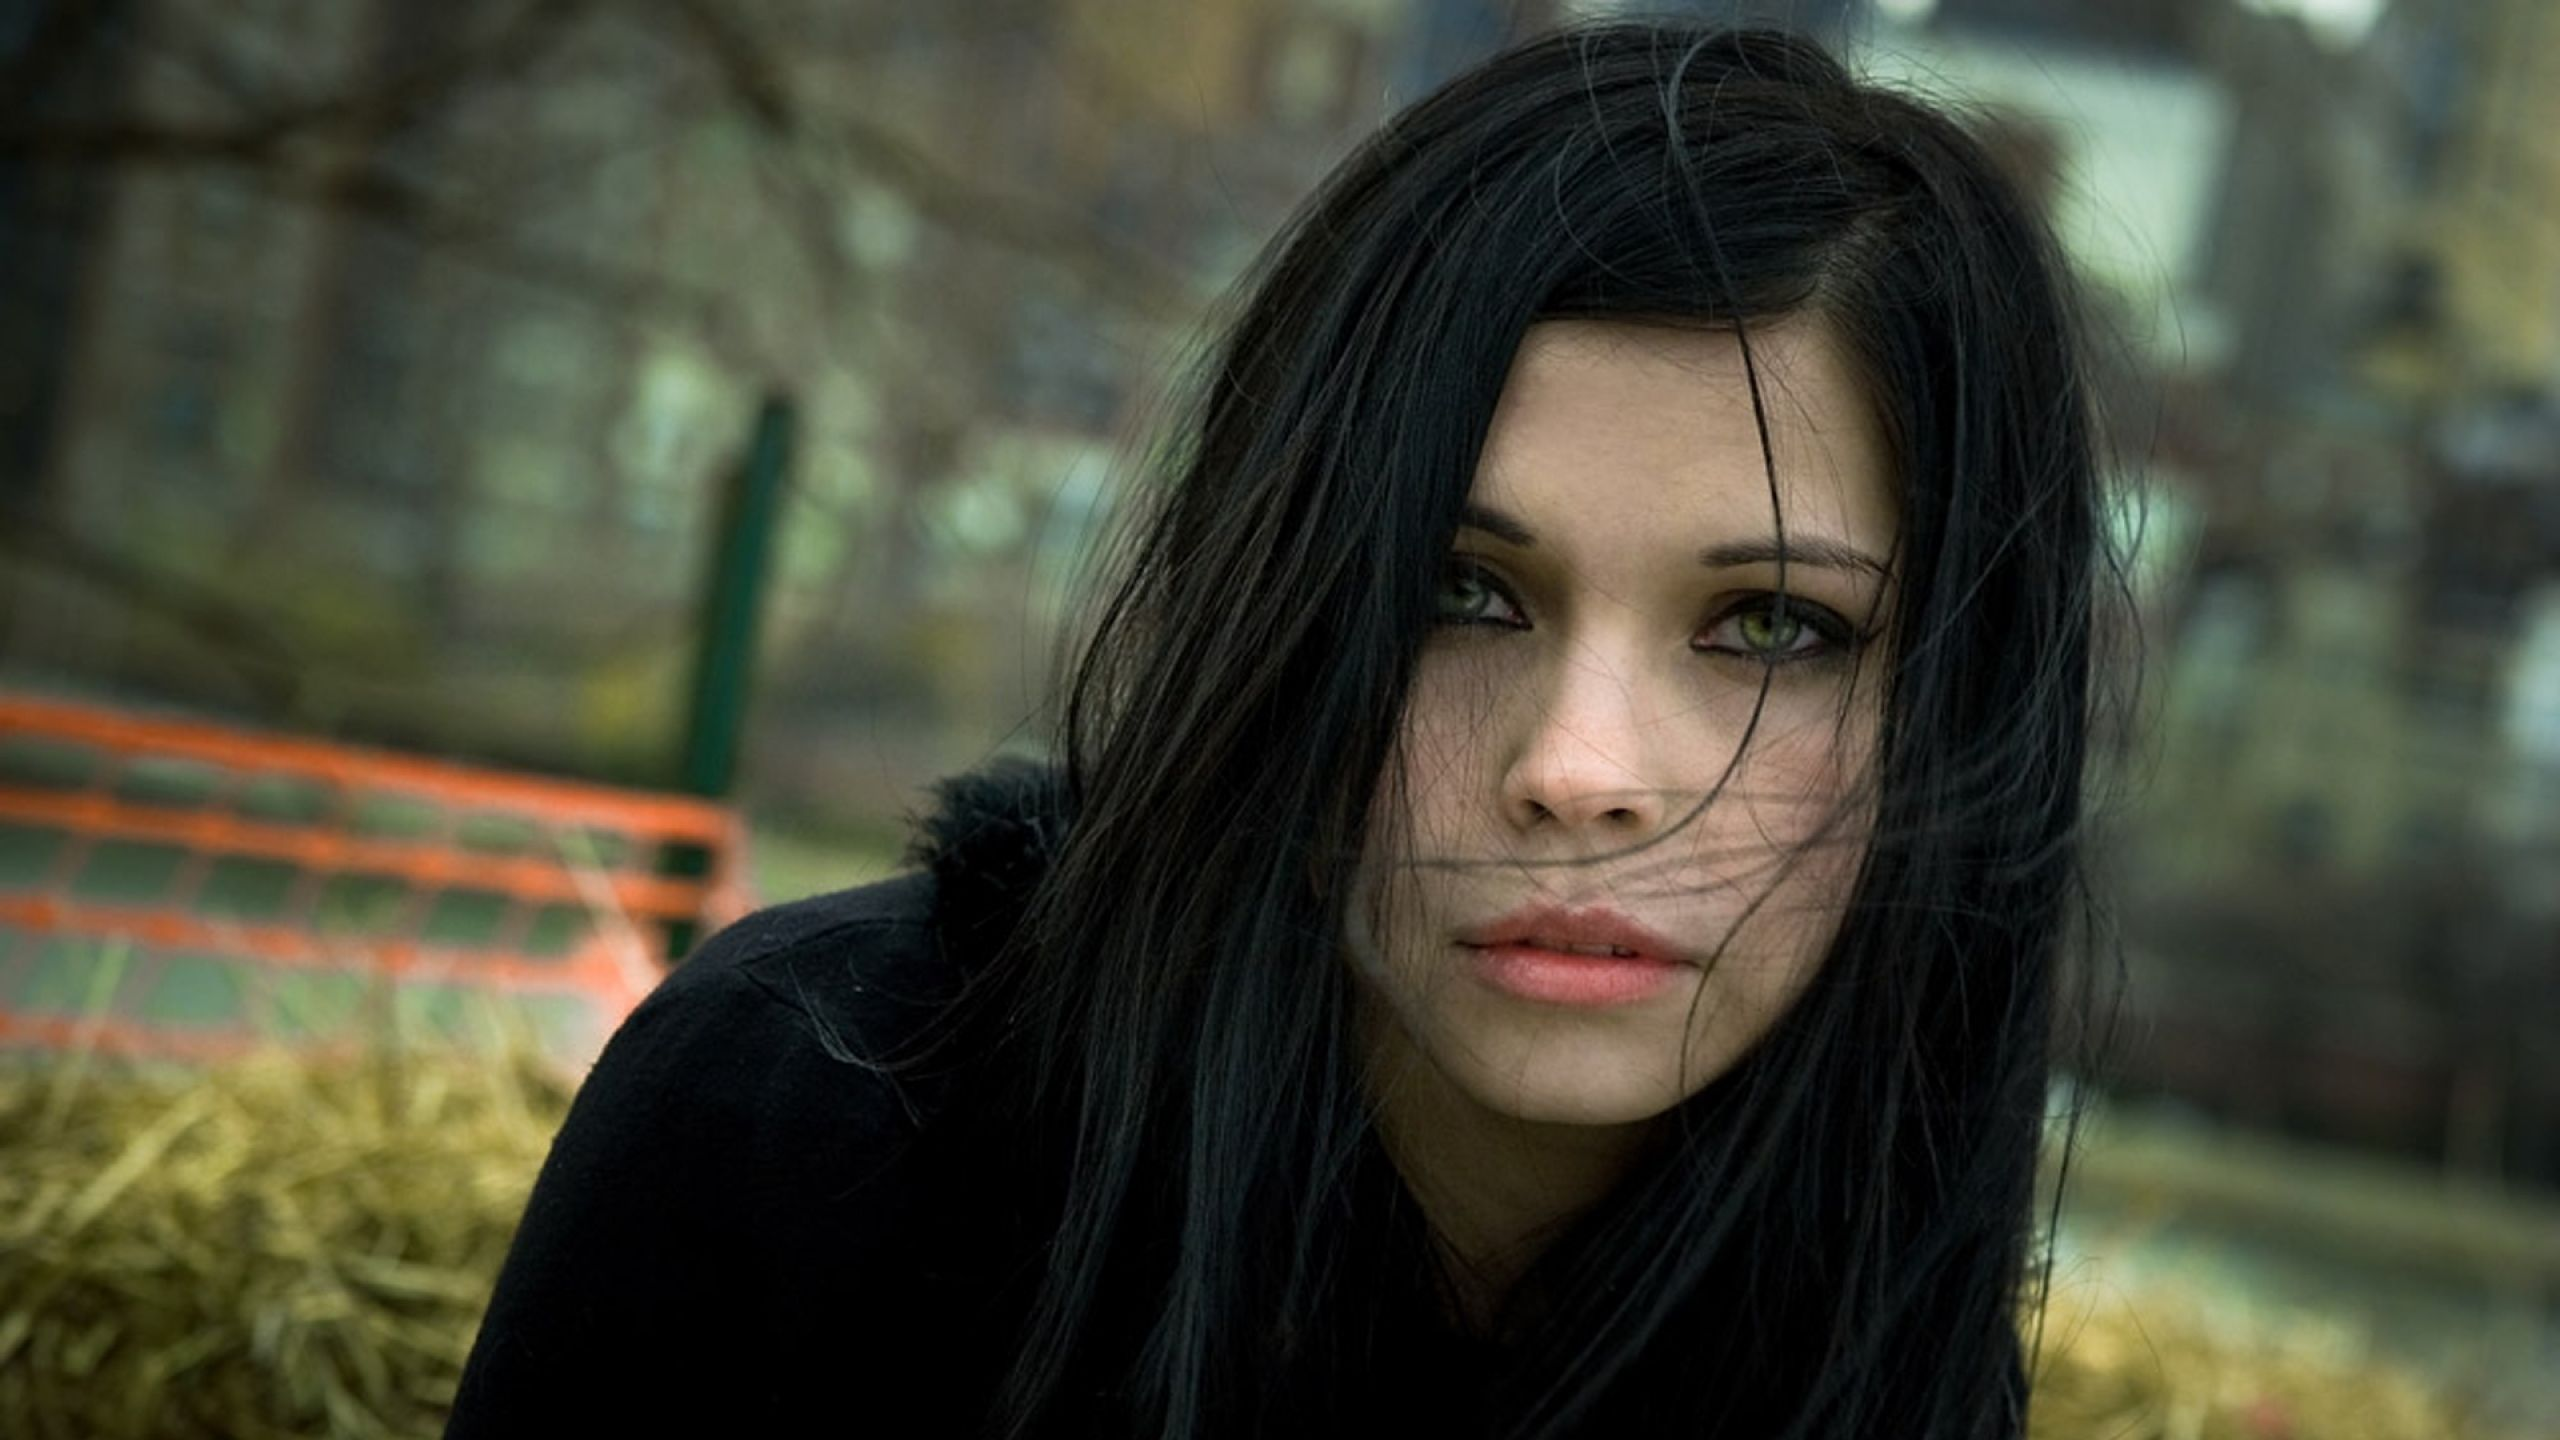 Dark Haired Gothic Girl Brunettes Women Blue Eyes Gothic Green Eyes Faces Pale Skin Black Hair Black Hair Green Eyes Black Hair Pale Skin Pale Skin